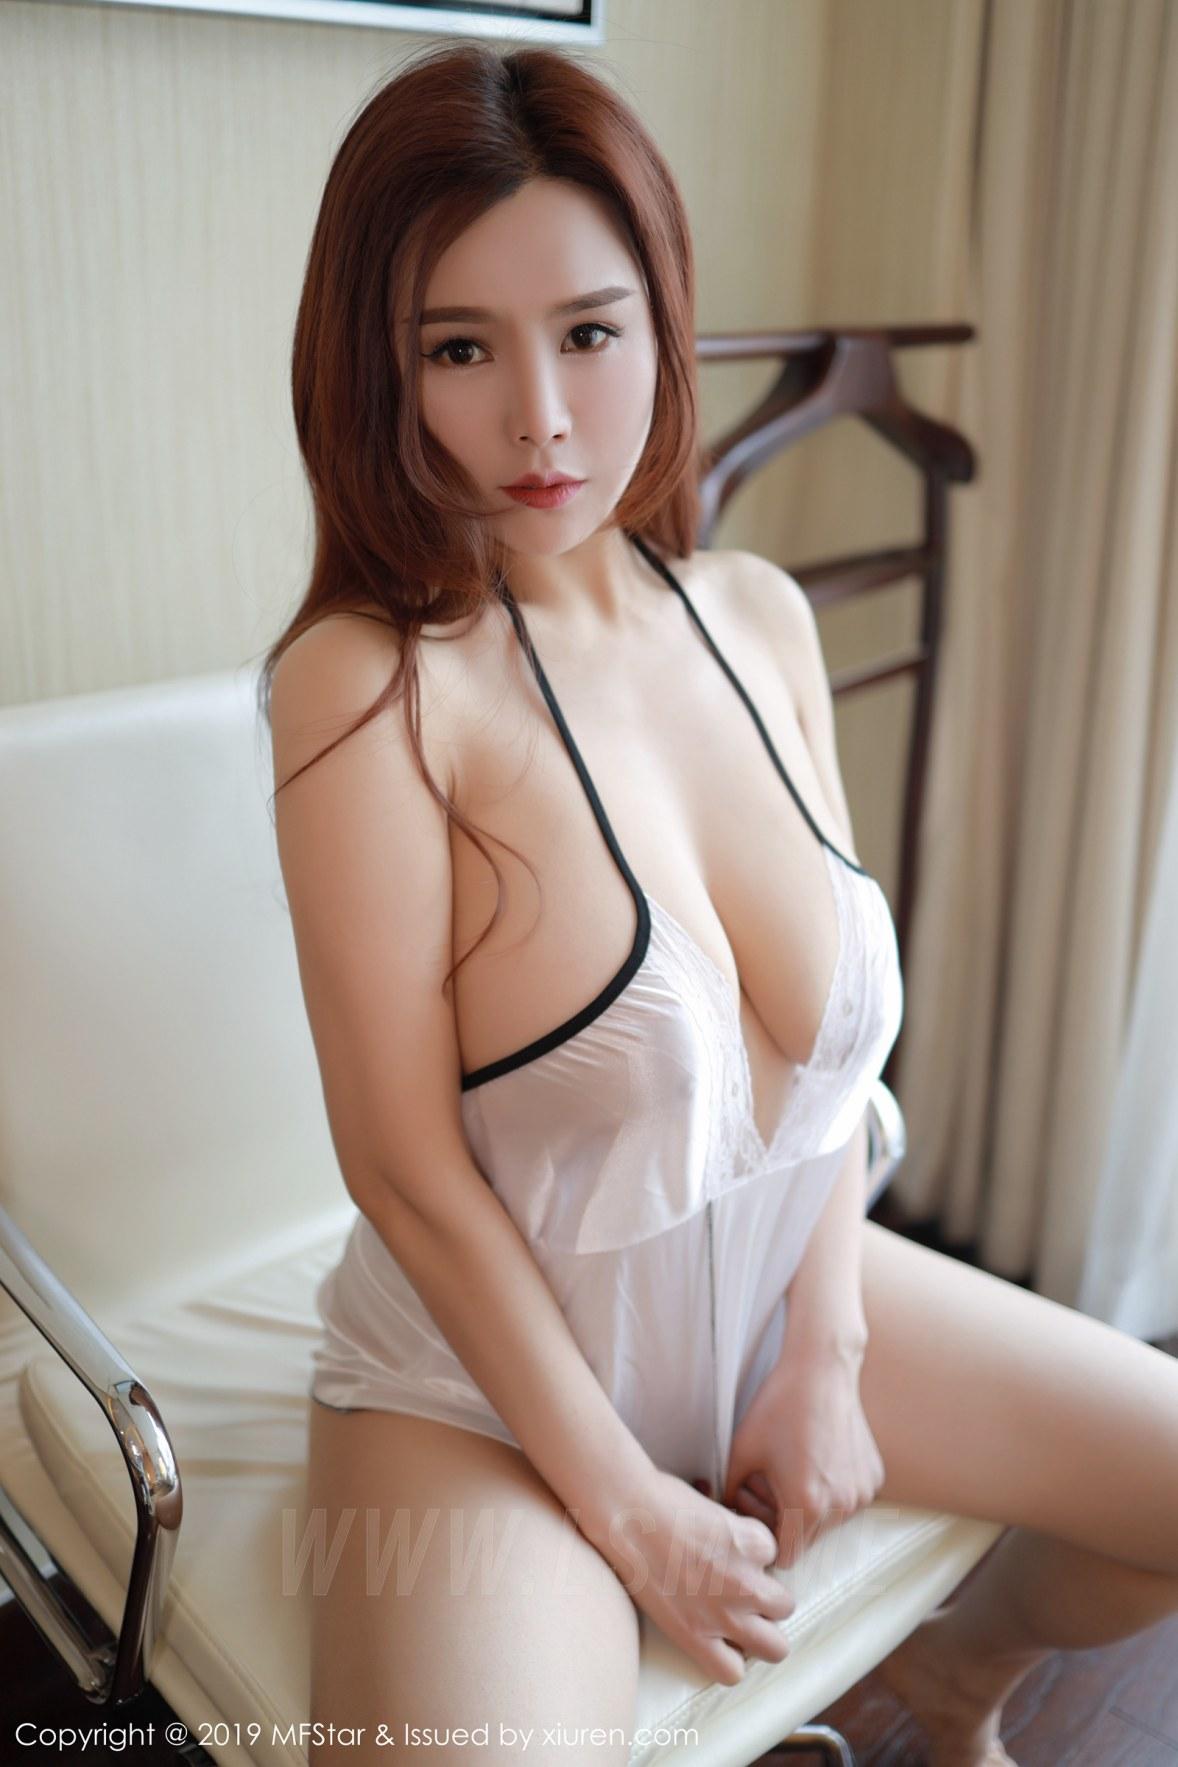 MFStar 模范学院 Vol.185 胡润曦201712  身材丰腴 - 2